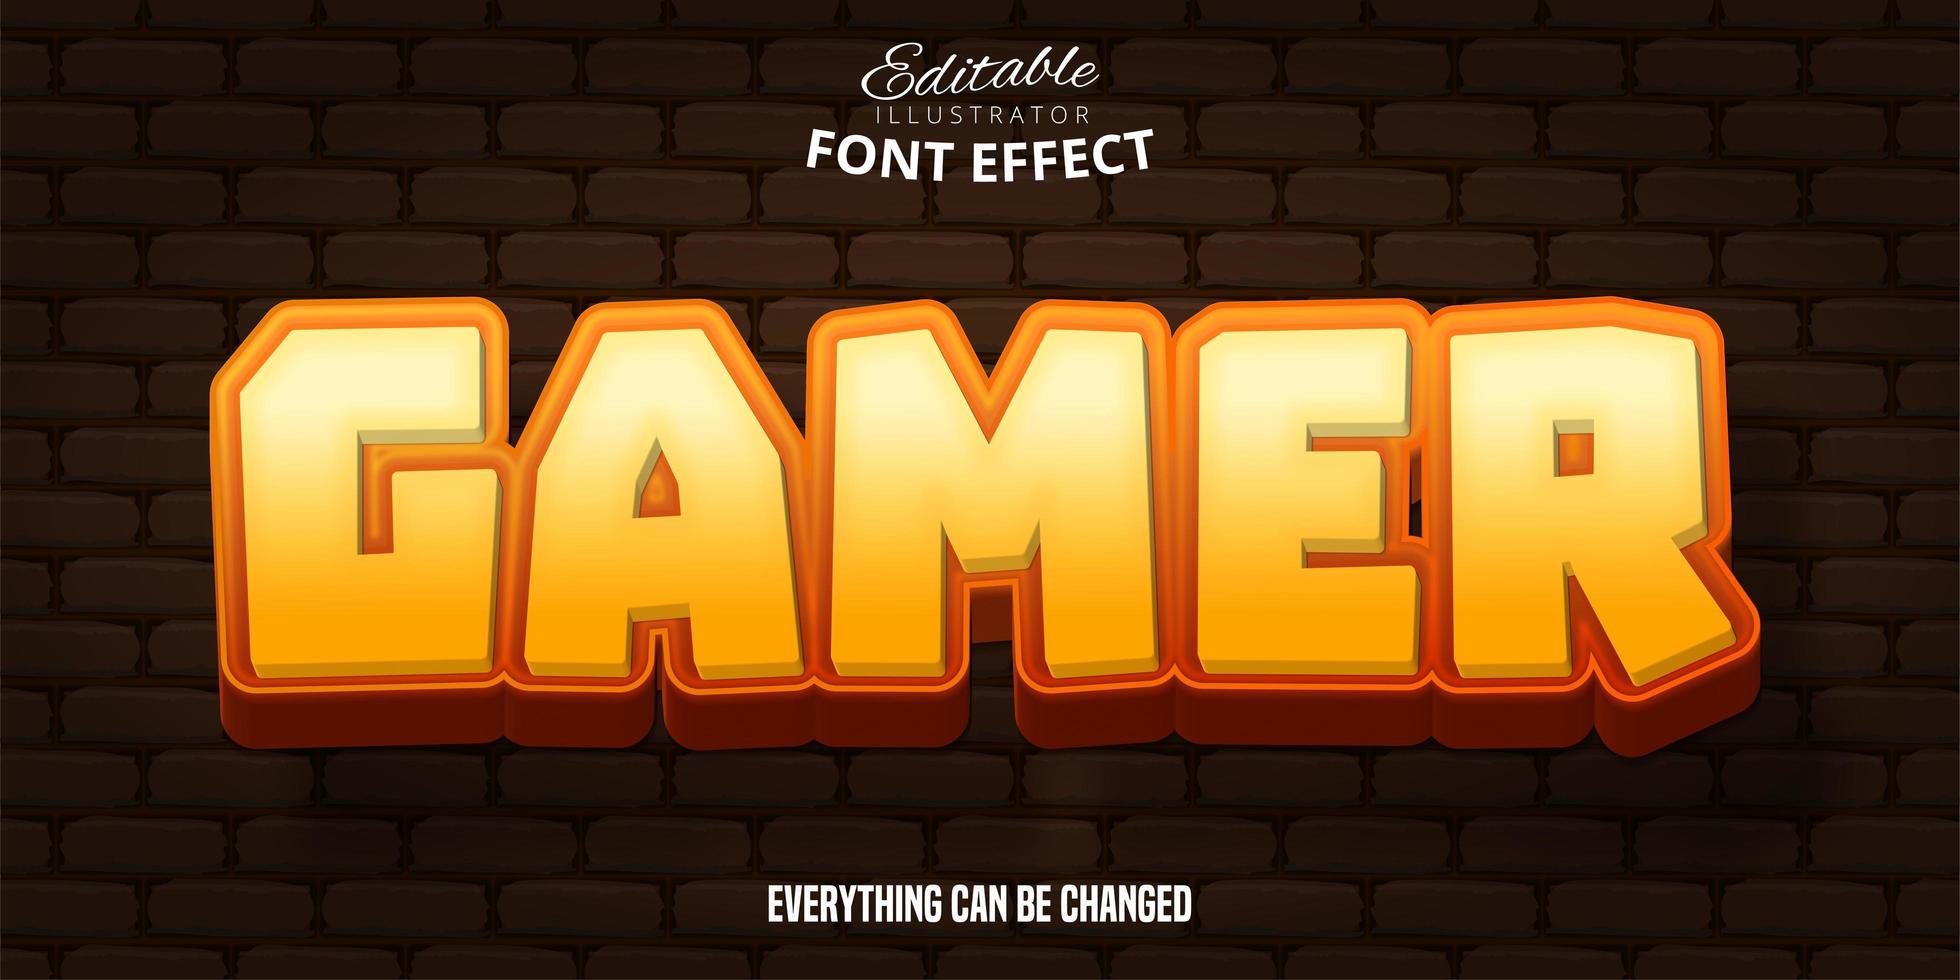 gamer-tekst, 3d bewerkbaar lettertype-effect vector